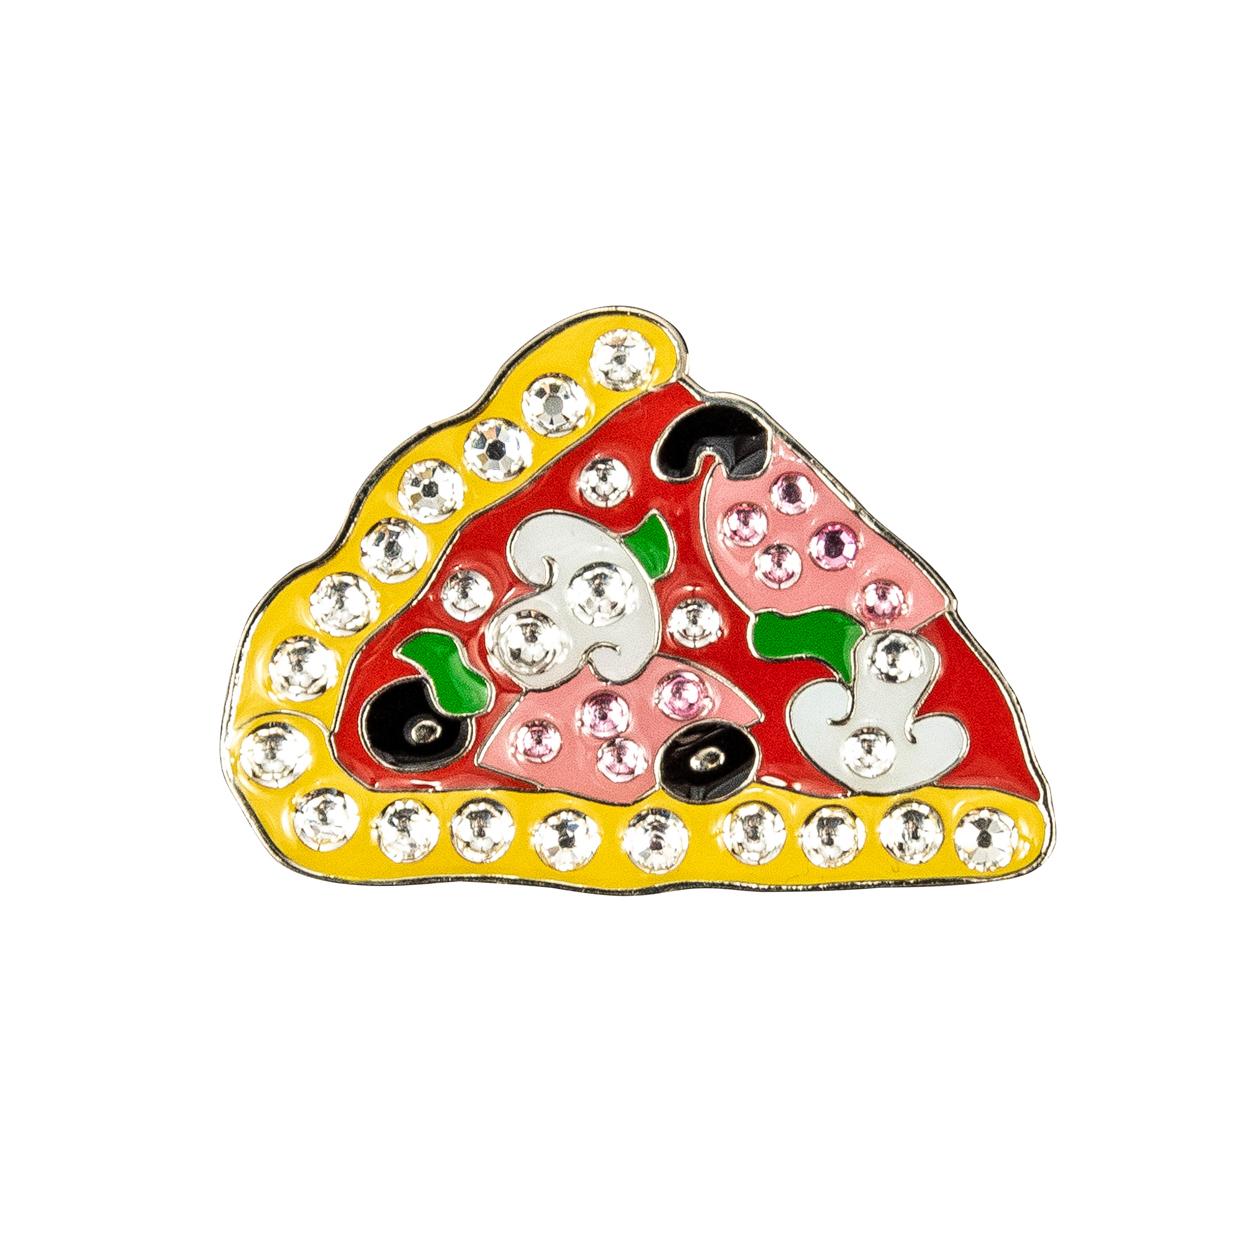 133. Pizza